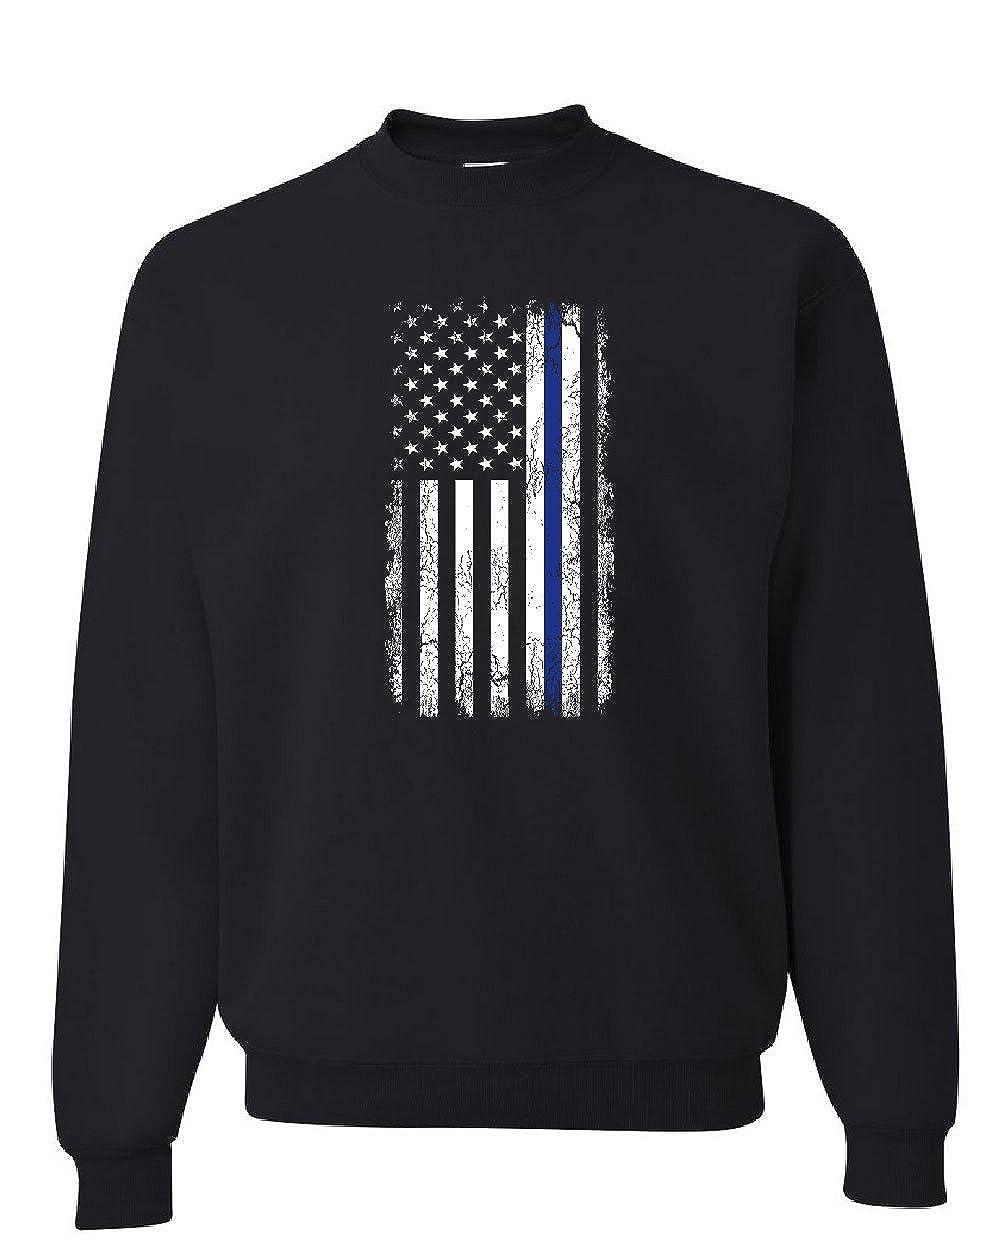 Tee Hunt Thin Blue Line American Flag Sweatshirt Stars and Stripes Police Sweater